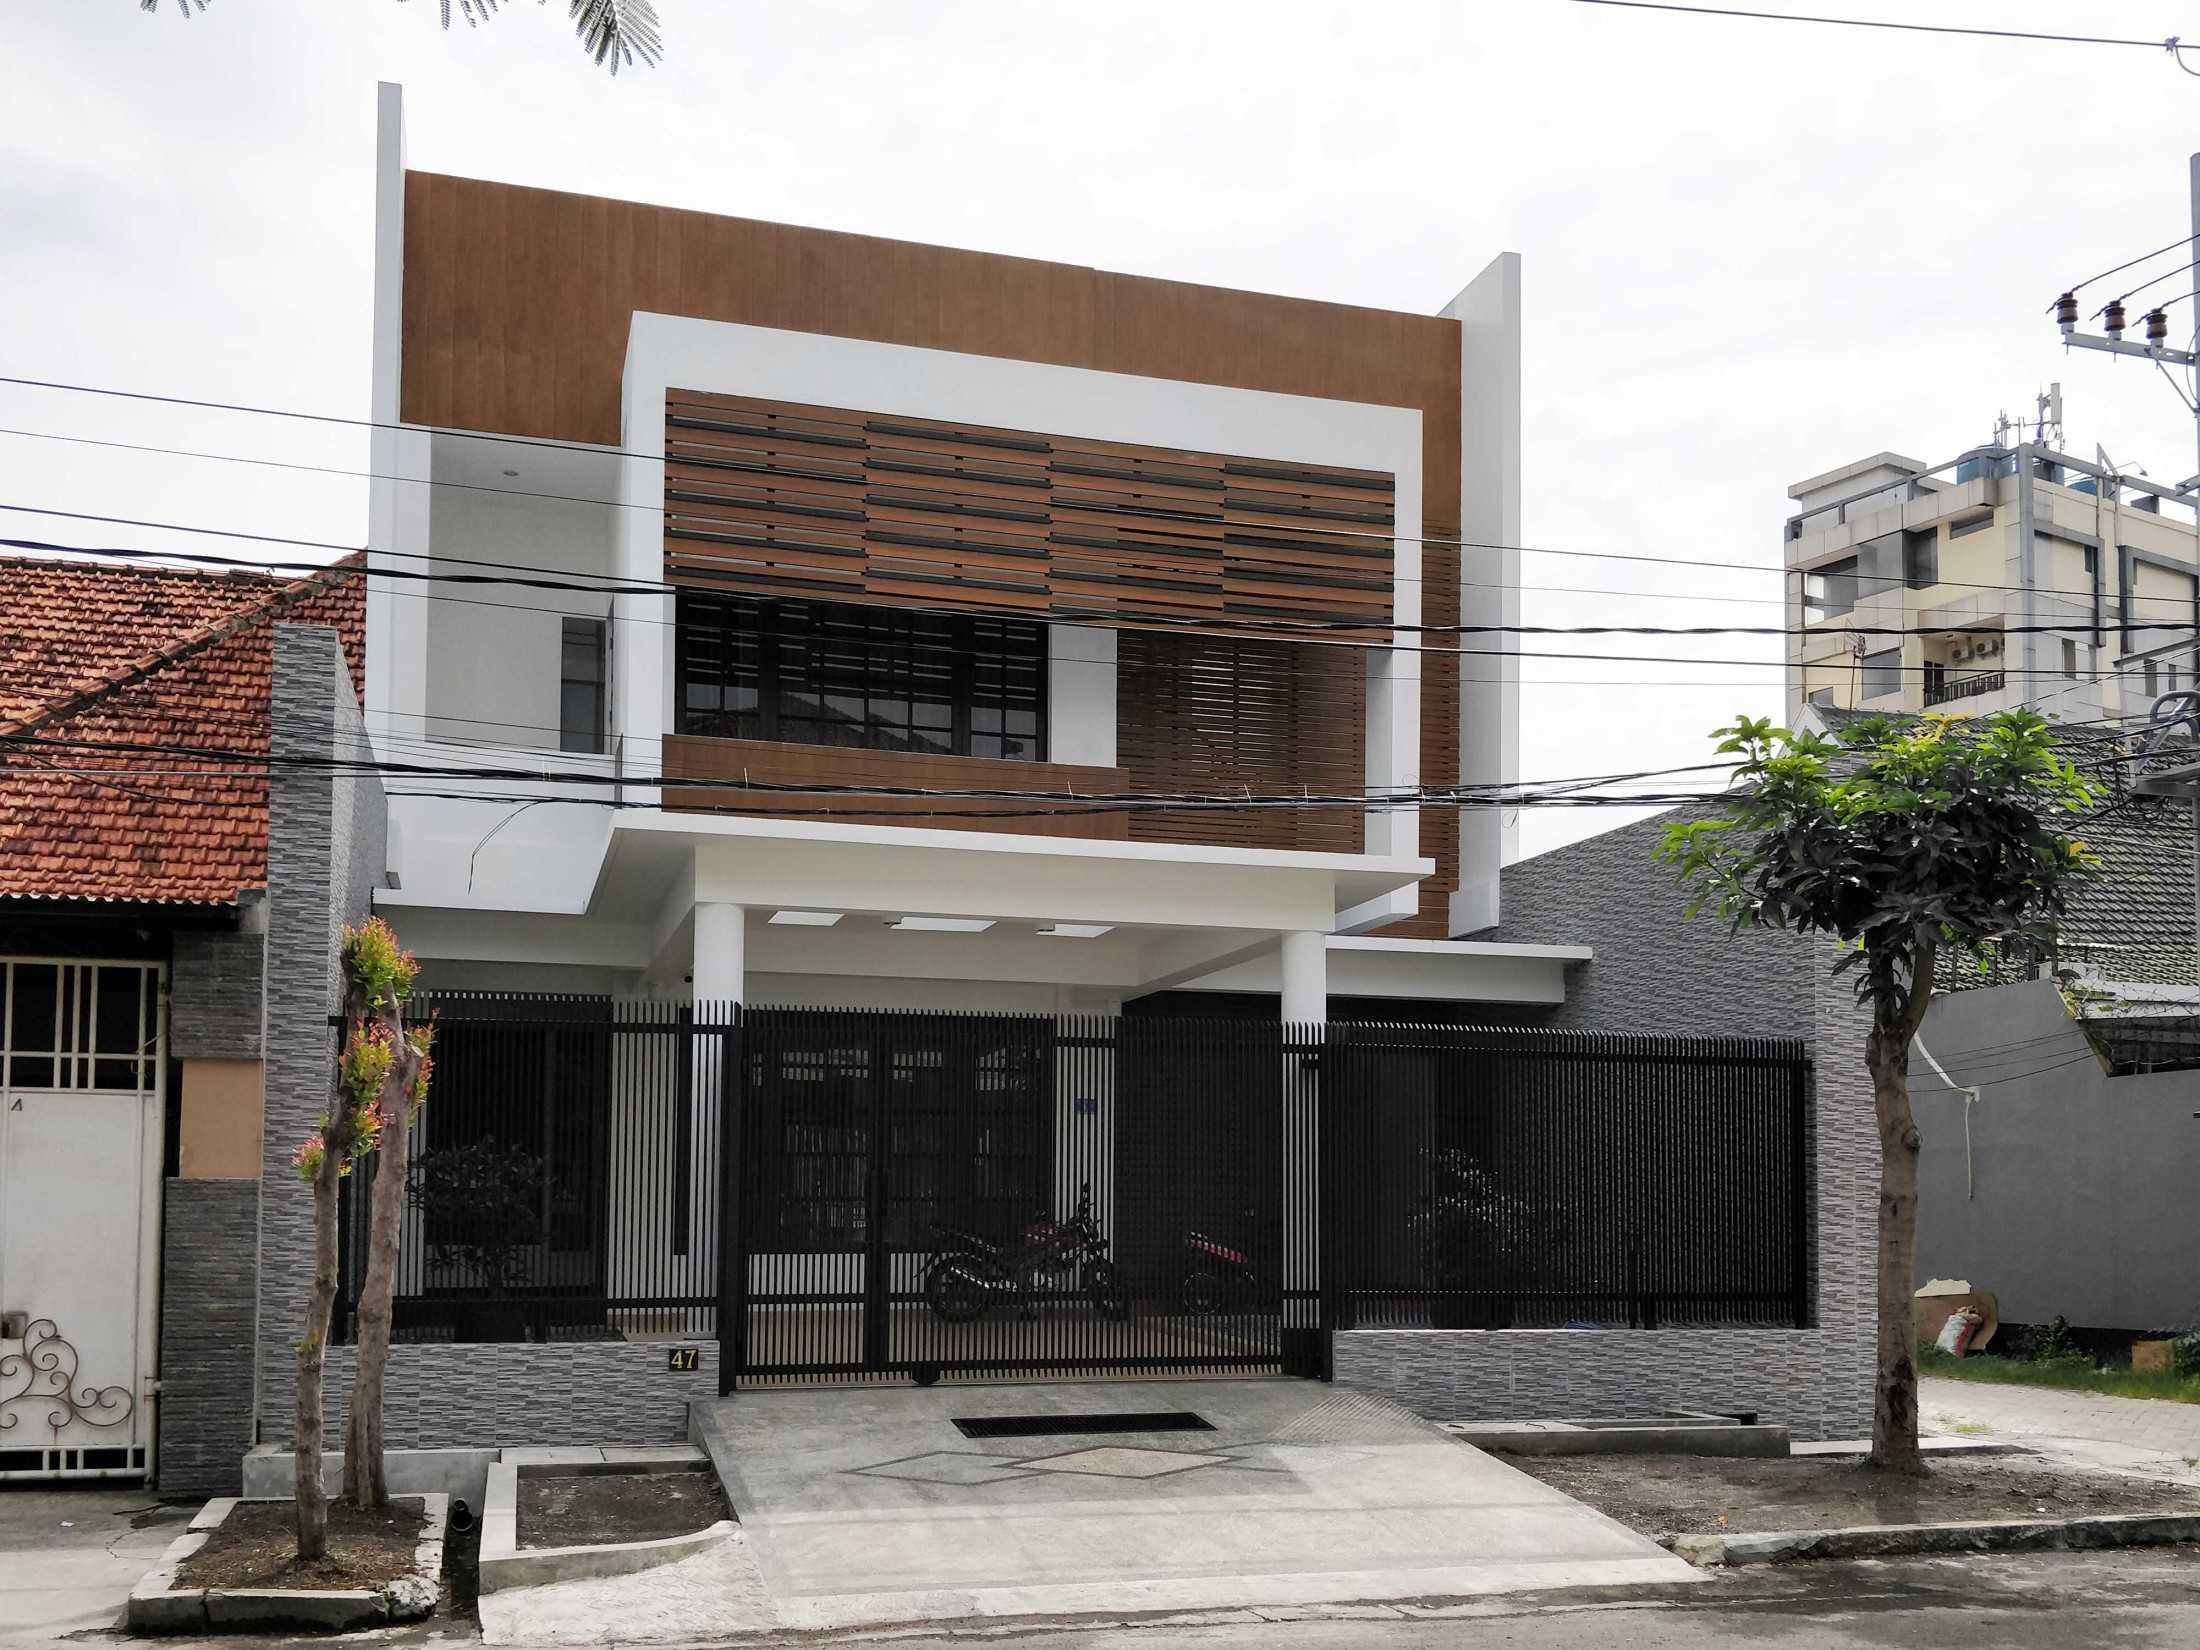 Bramasta Redy Rumah Seruni Surabaya, Kota Sby, Jawa Timur, Indonesia Surabaya, Kota Sby, Jawa Timur, Indonesia Bramasta-Redy-Rumah-Seruni  94619